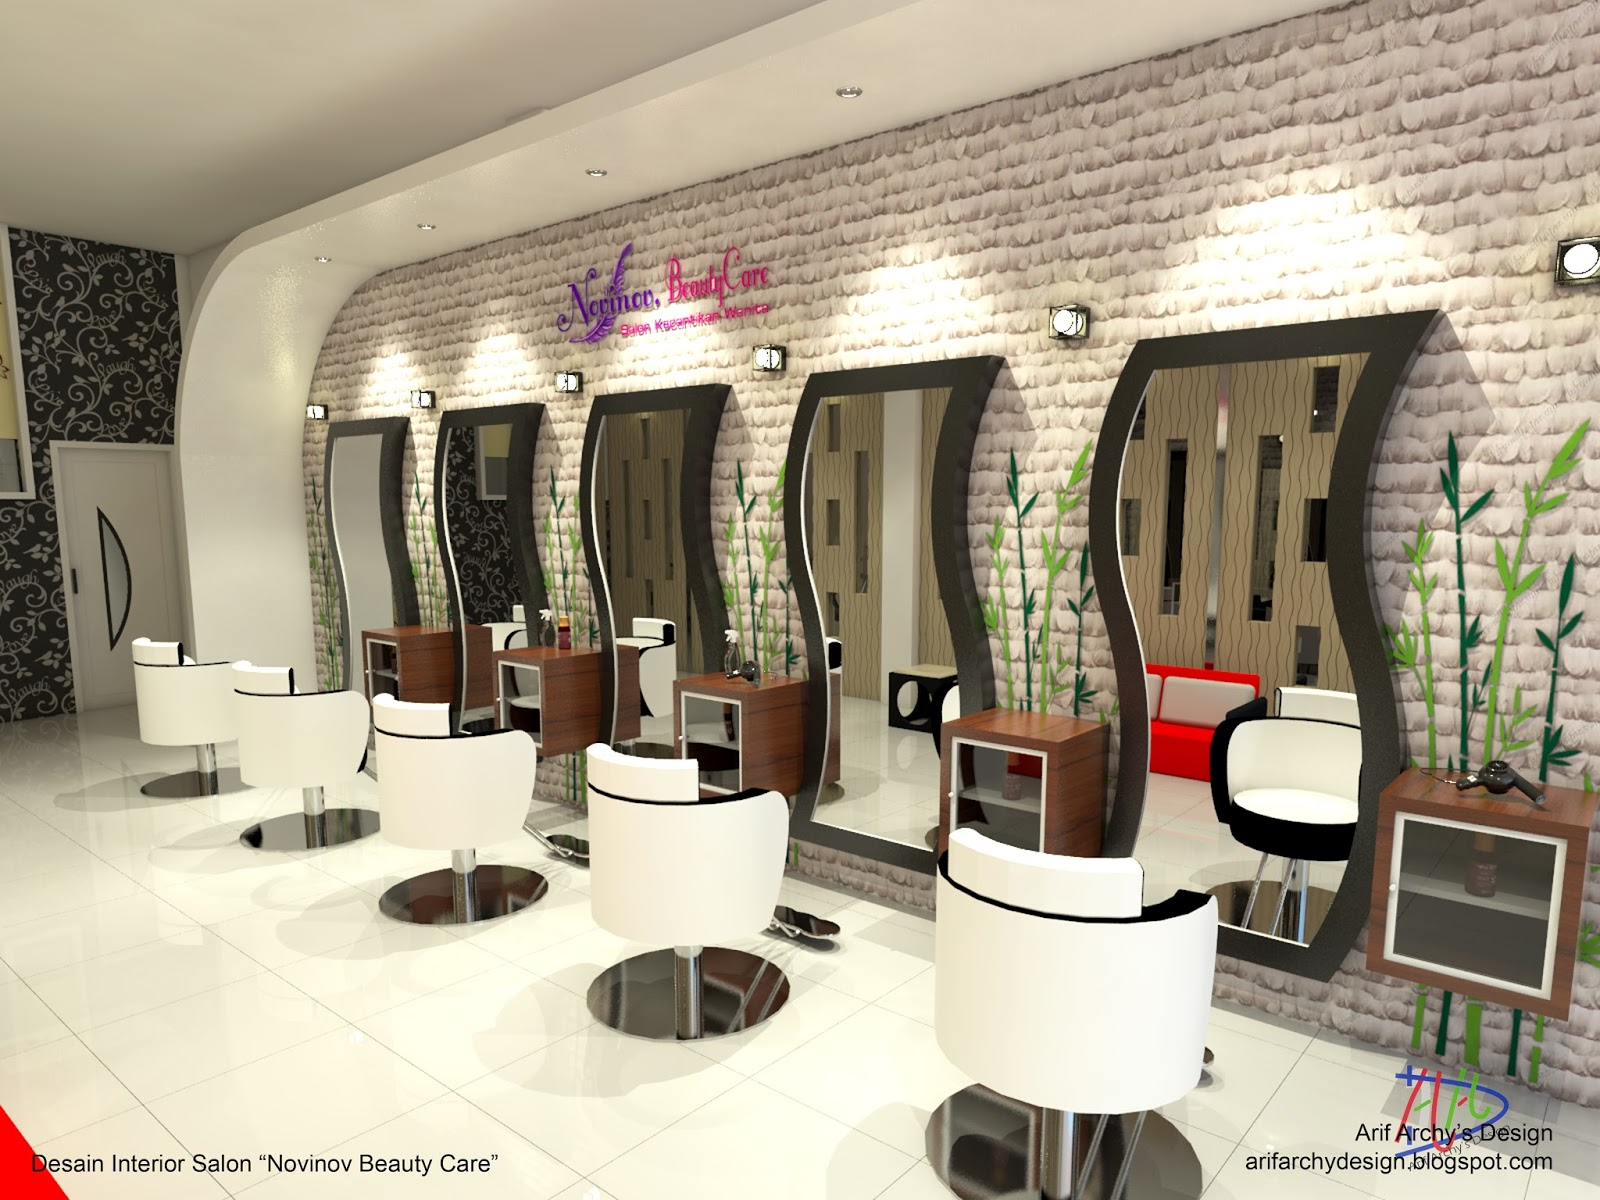 Desain Barbershop Dan Salon Kecantikan Wanita Sambas